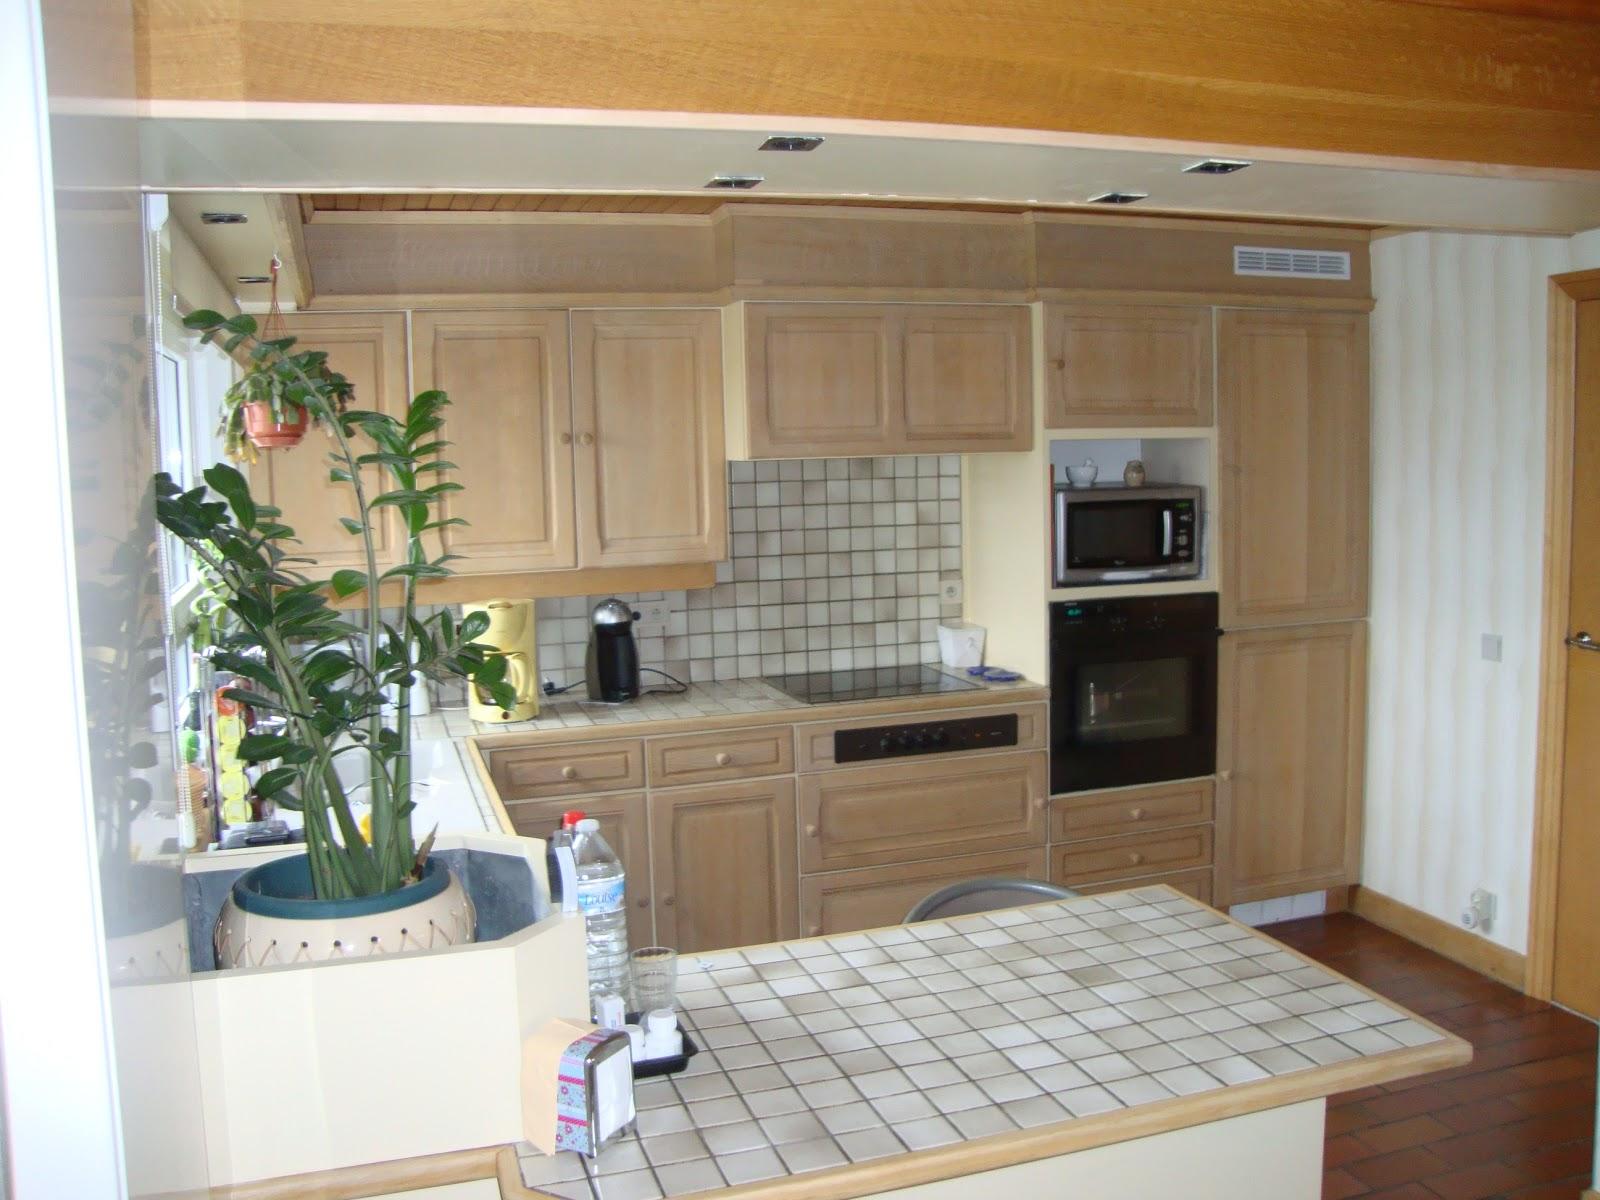 Eiken keuken vernieuwen trendy eiken houten keuken wit gespoten